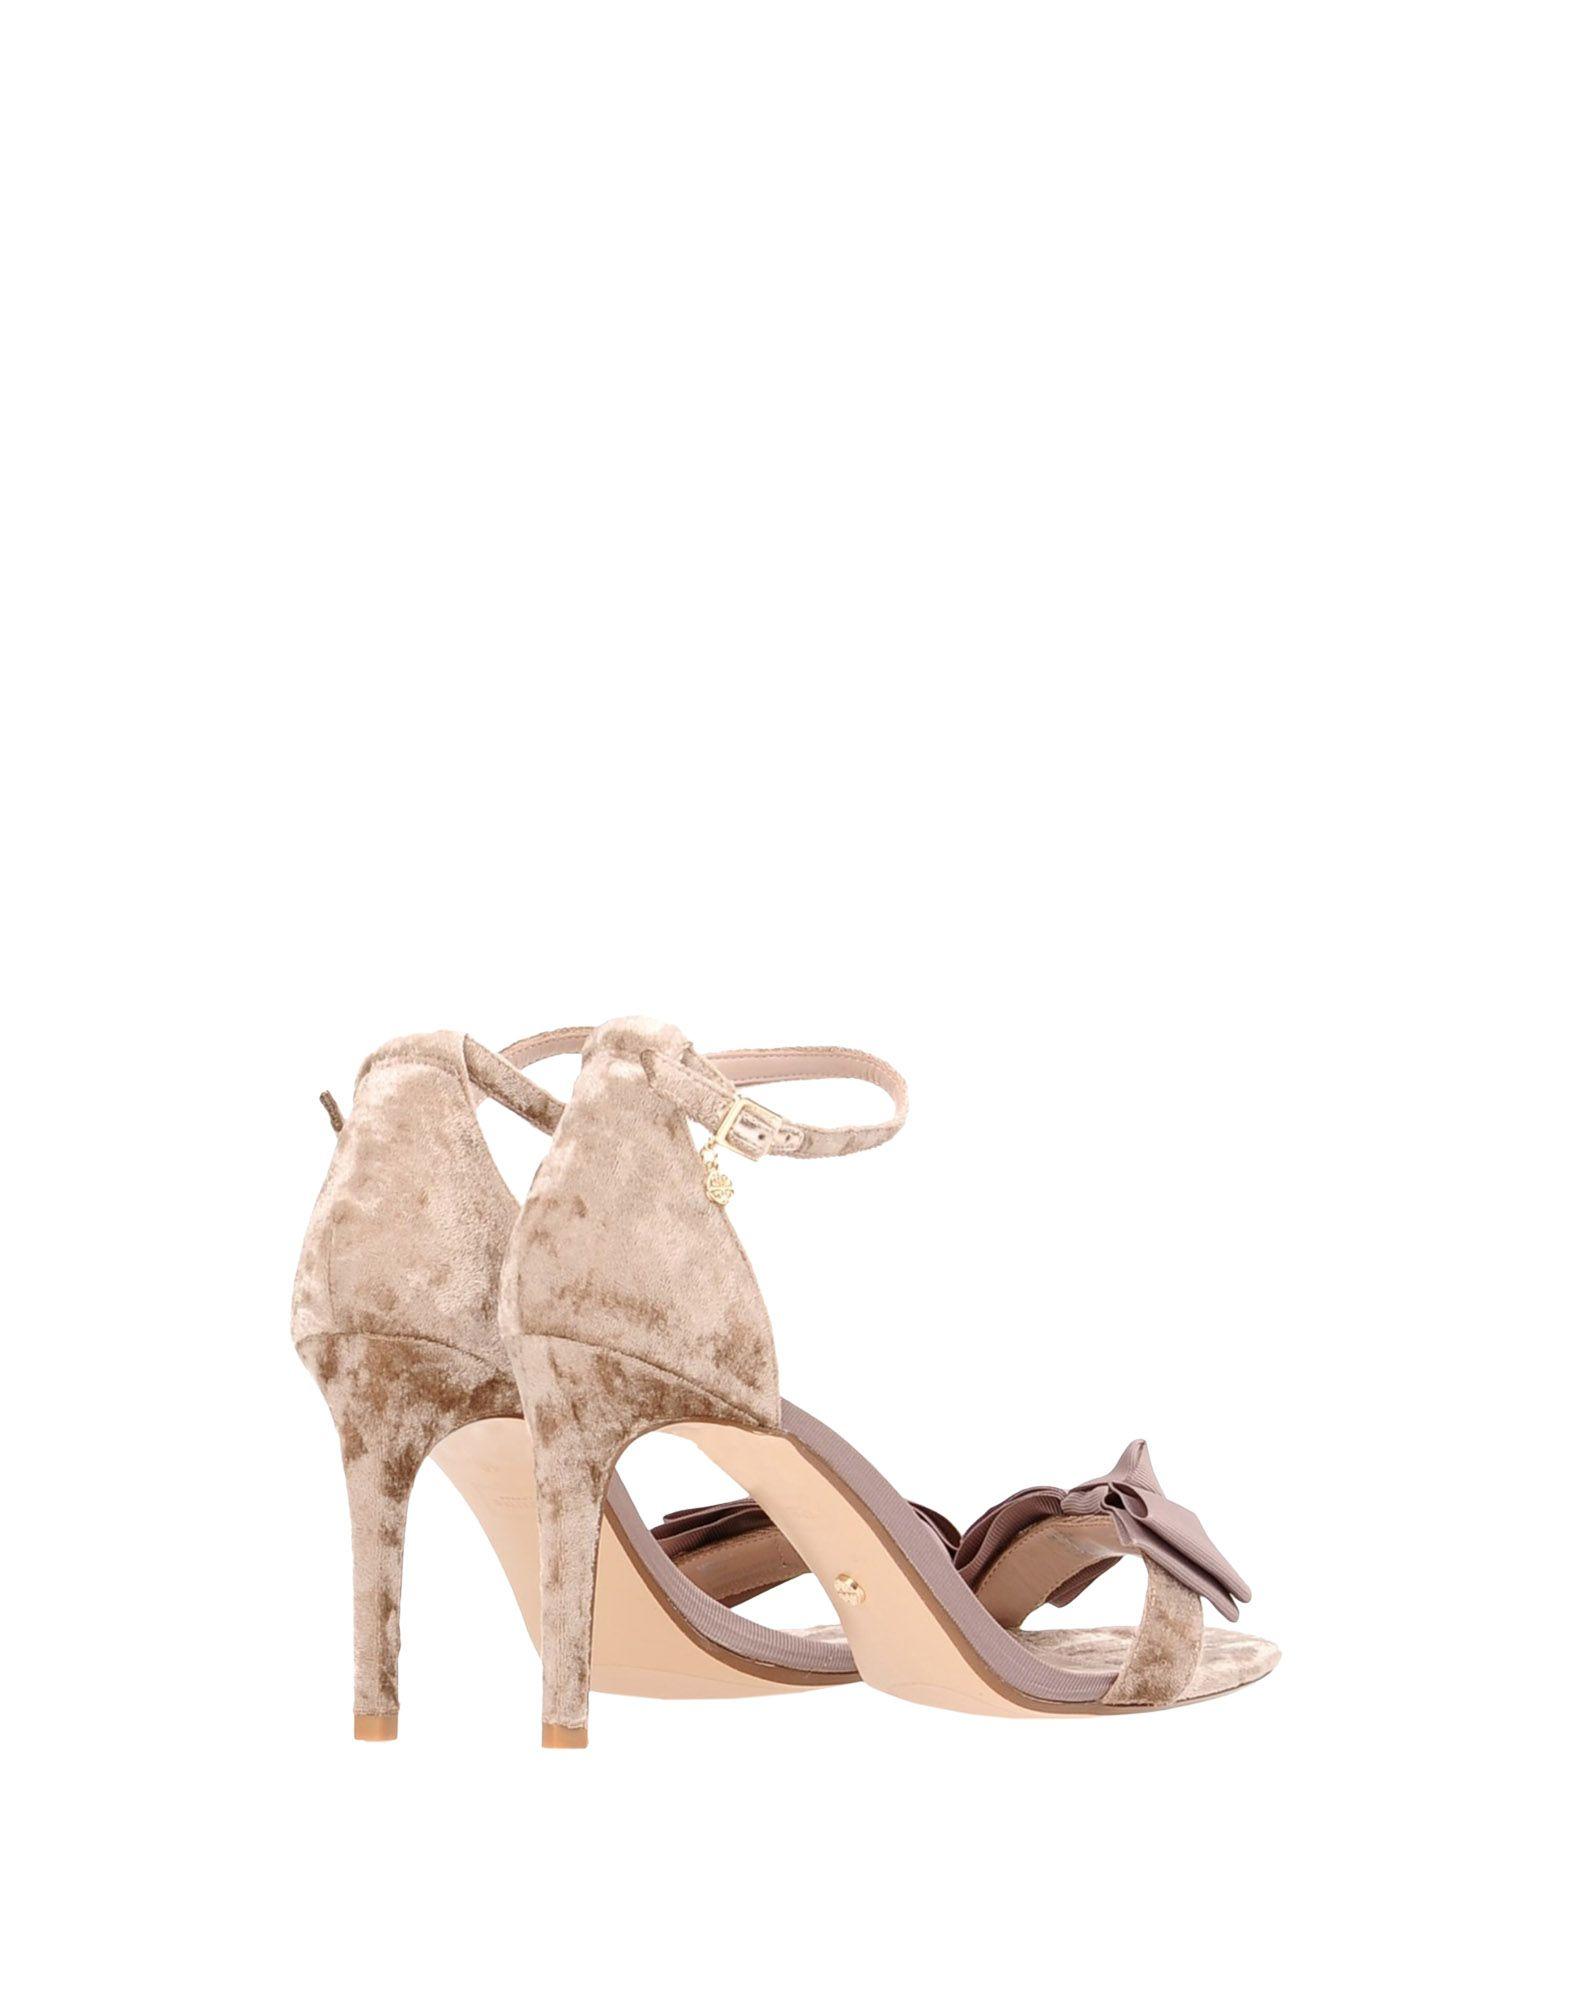 Dune London Sandalen Damen  11334689BV Gute Qualität beliebte Schuhe